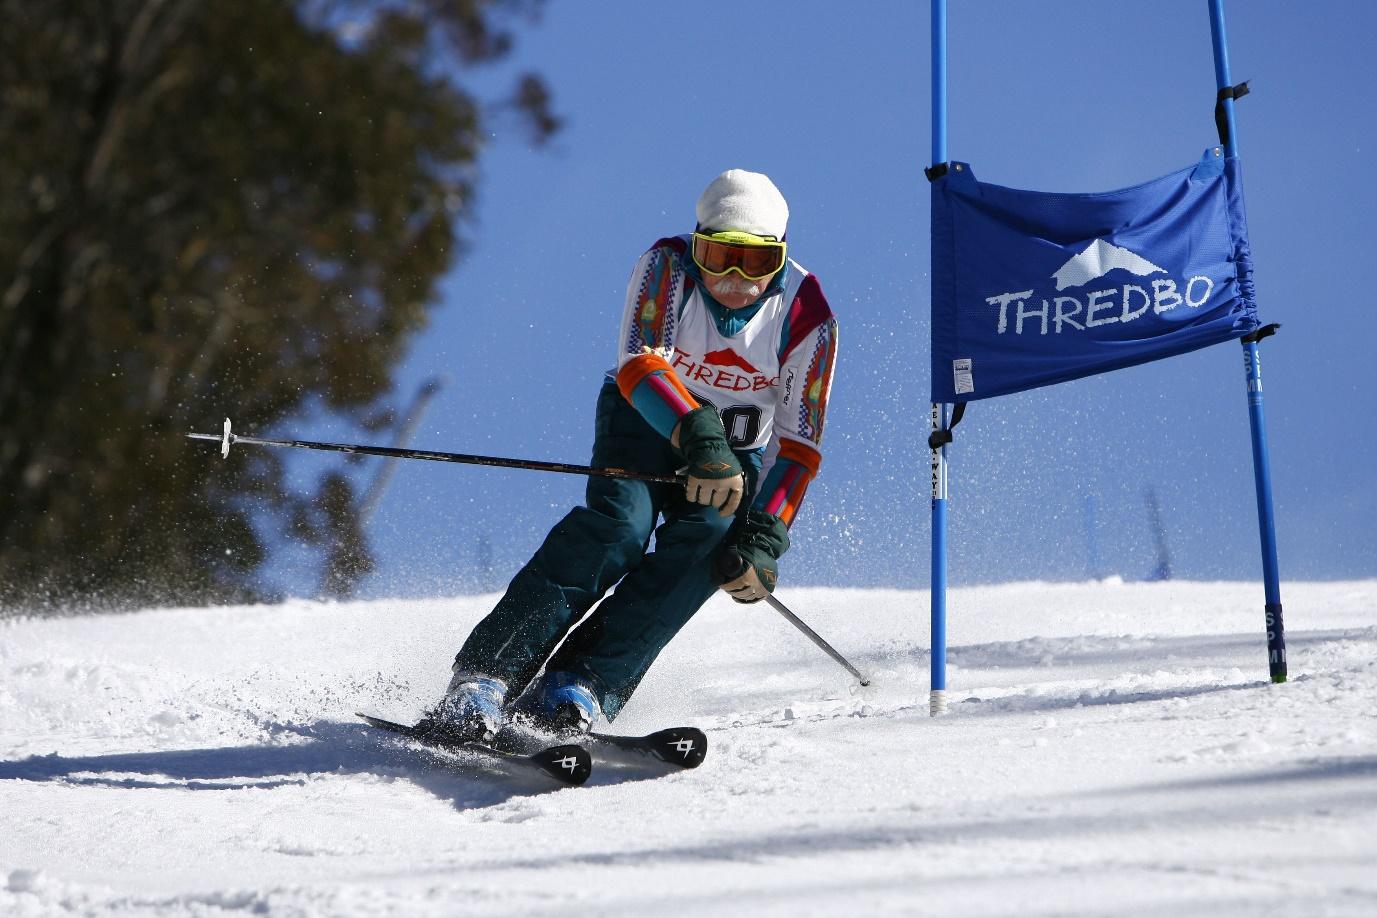 An elderly man skis downhill